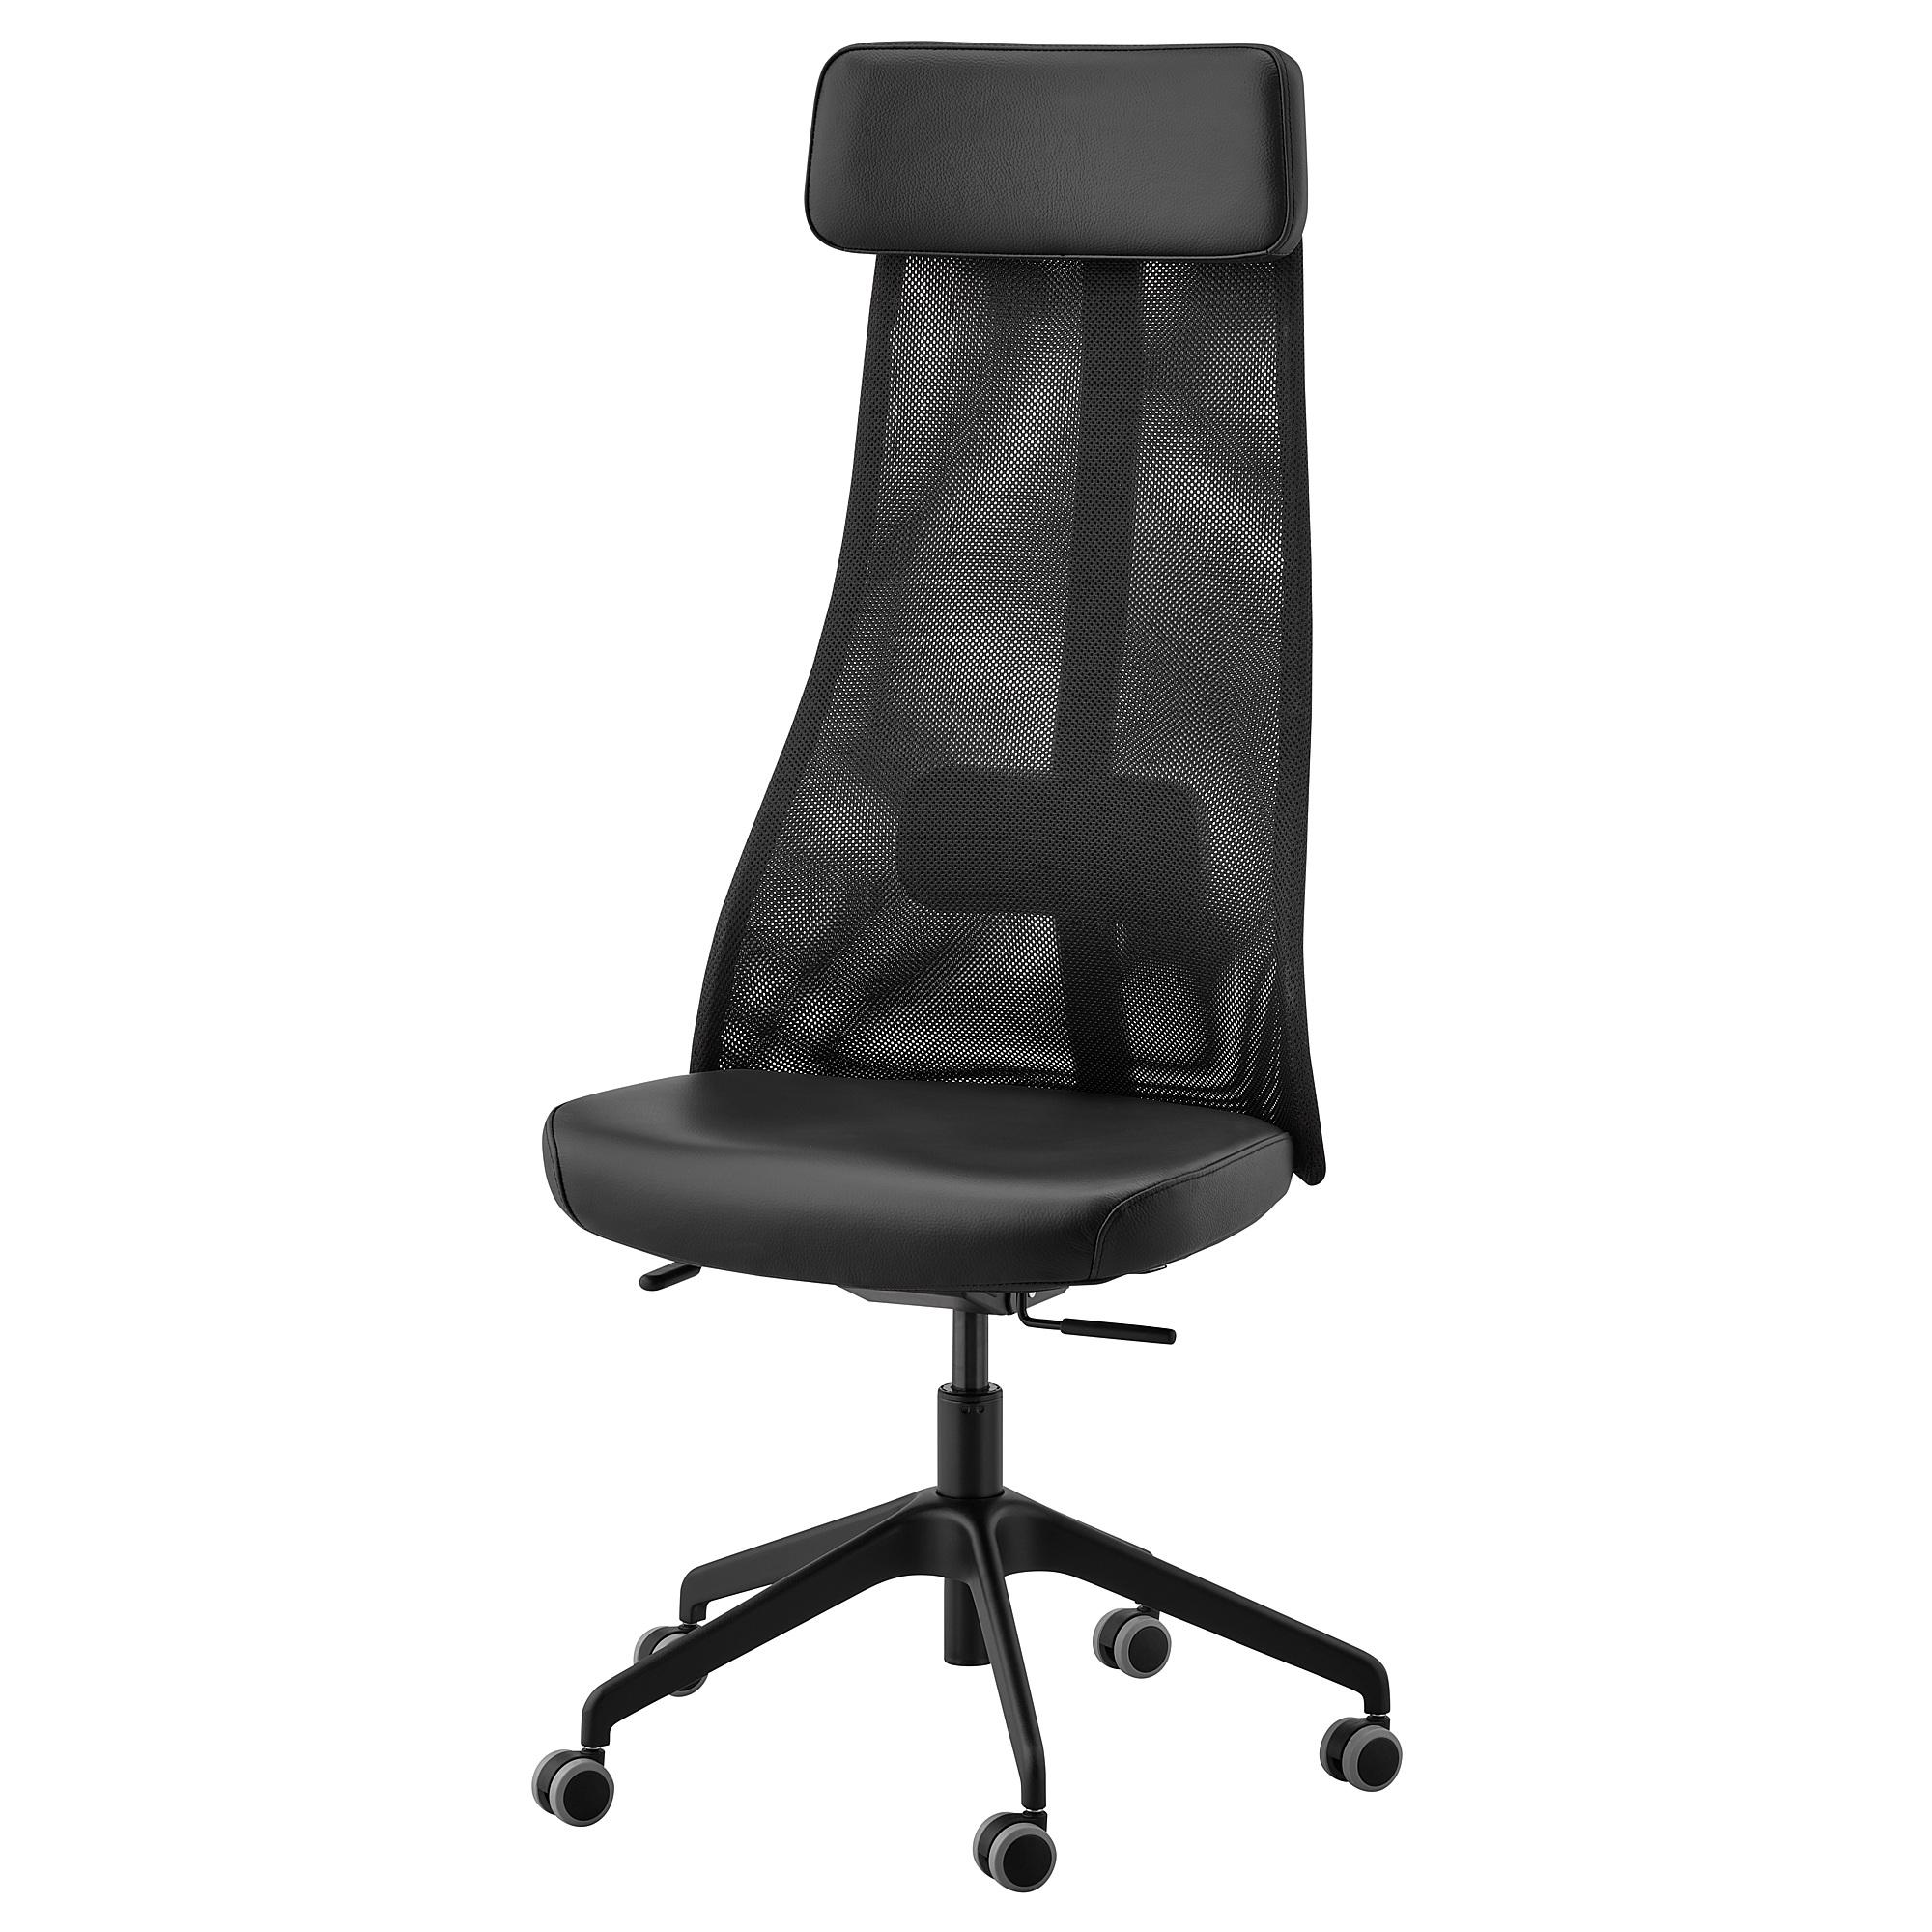 Office Chair Glose Black Ikea Hong Kong